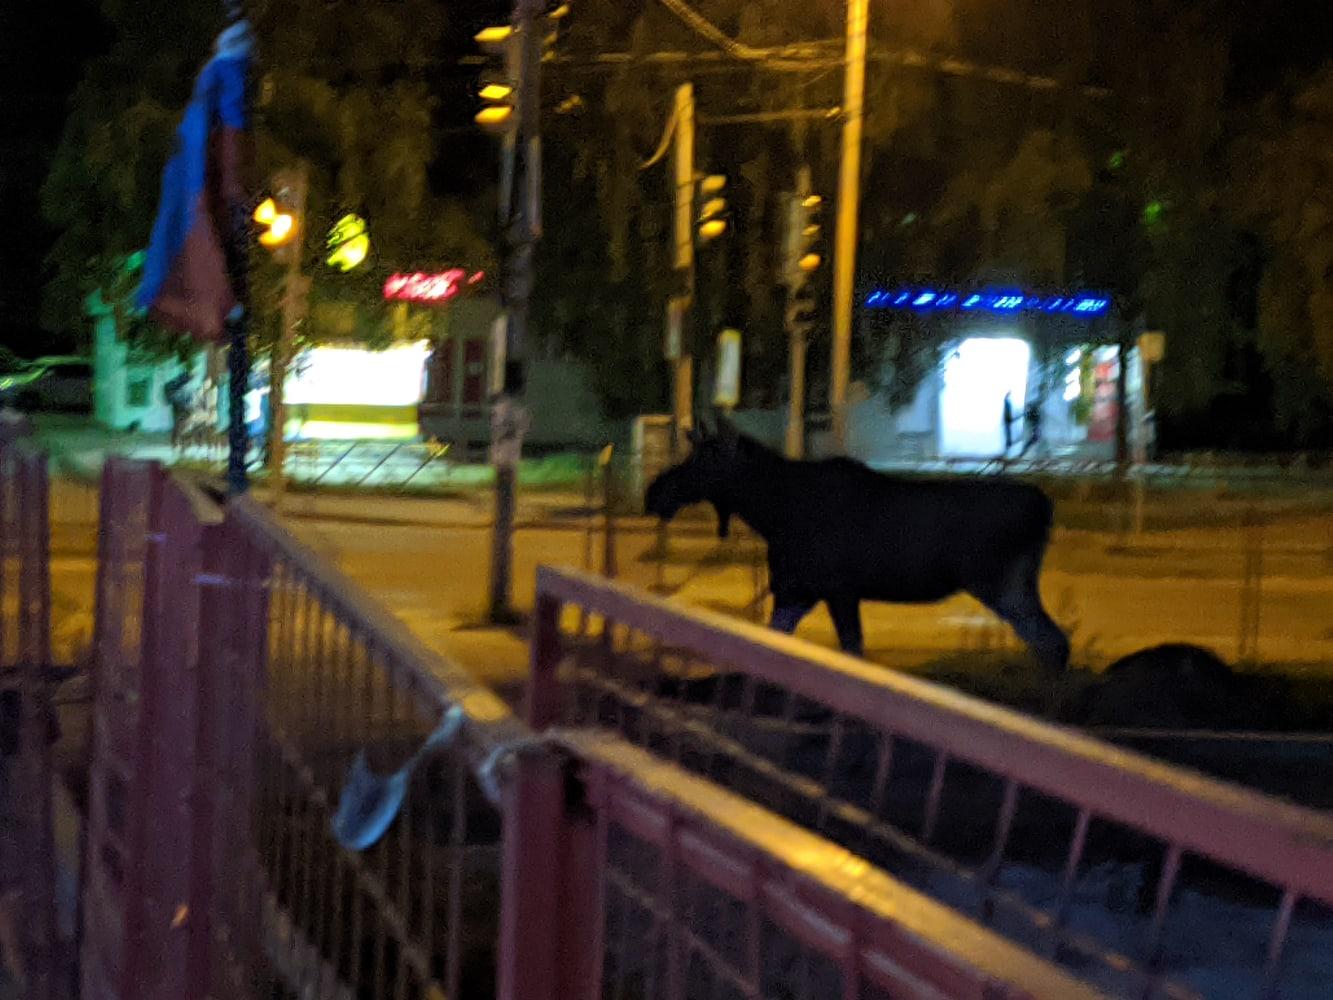 На проспекте Машиностроителей в Ярославле гулял лось